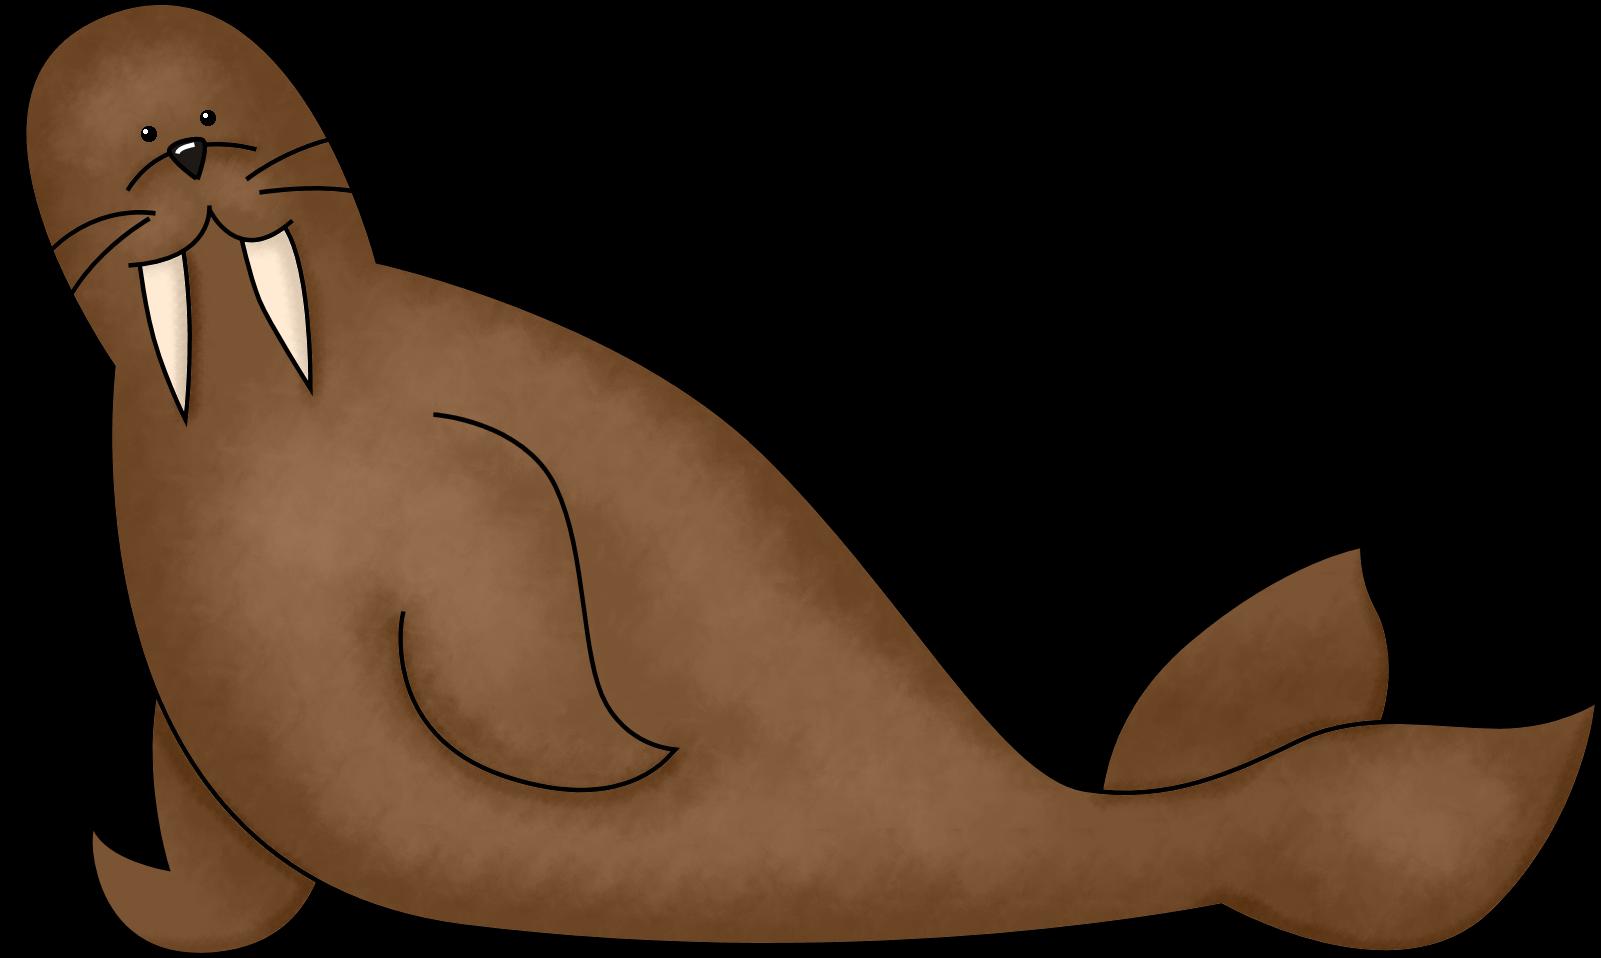 Cute walrus stock illustration Illustration of collection